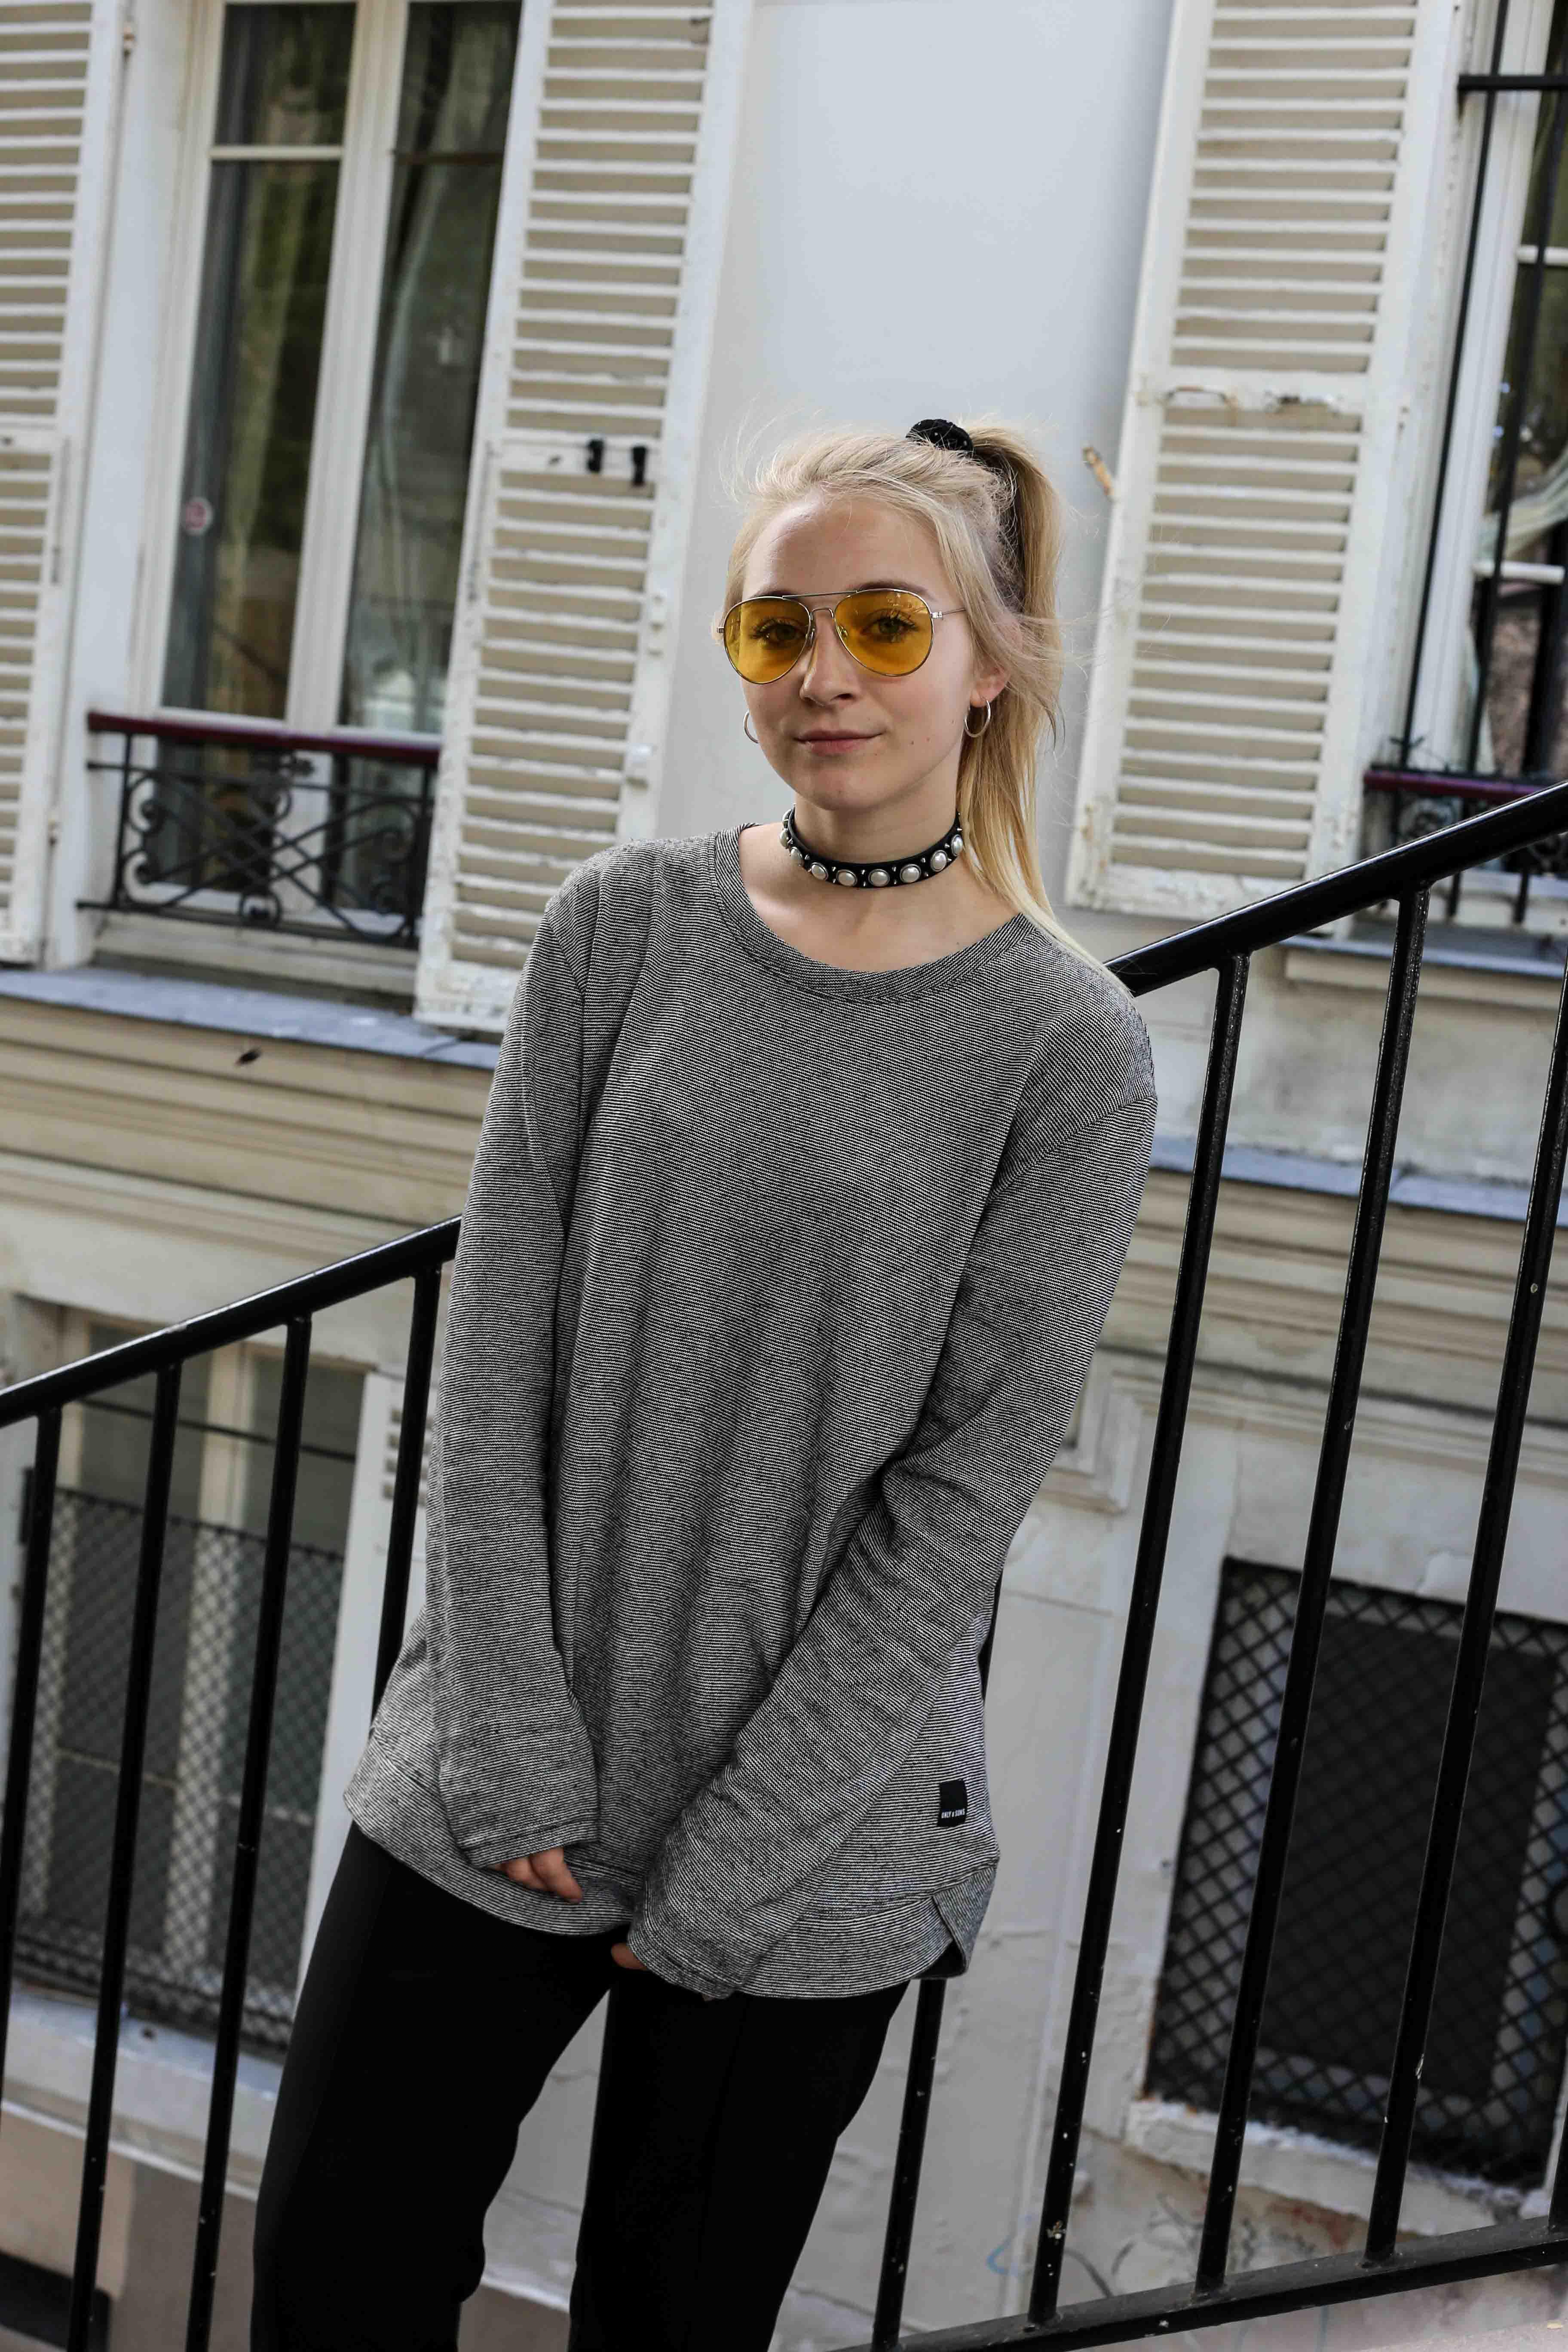 streetstyle-look-paris-loose-fit-hose-boyfriend-sweater-modeblog-fashionblog_2226